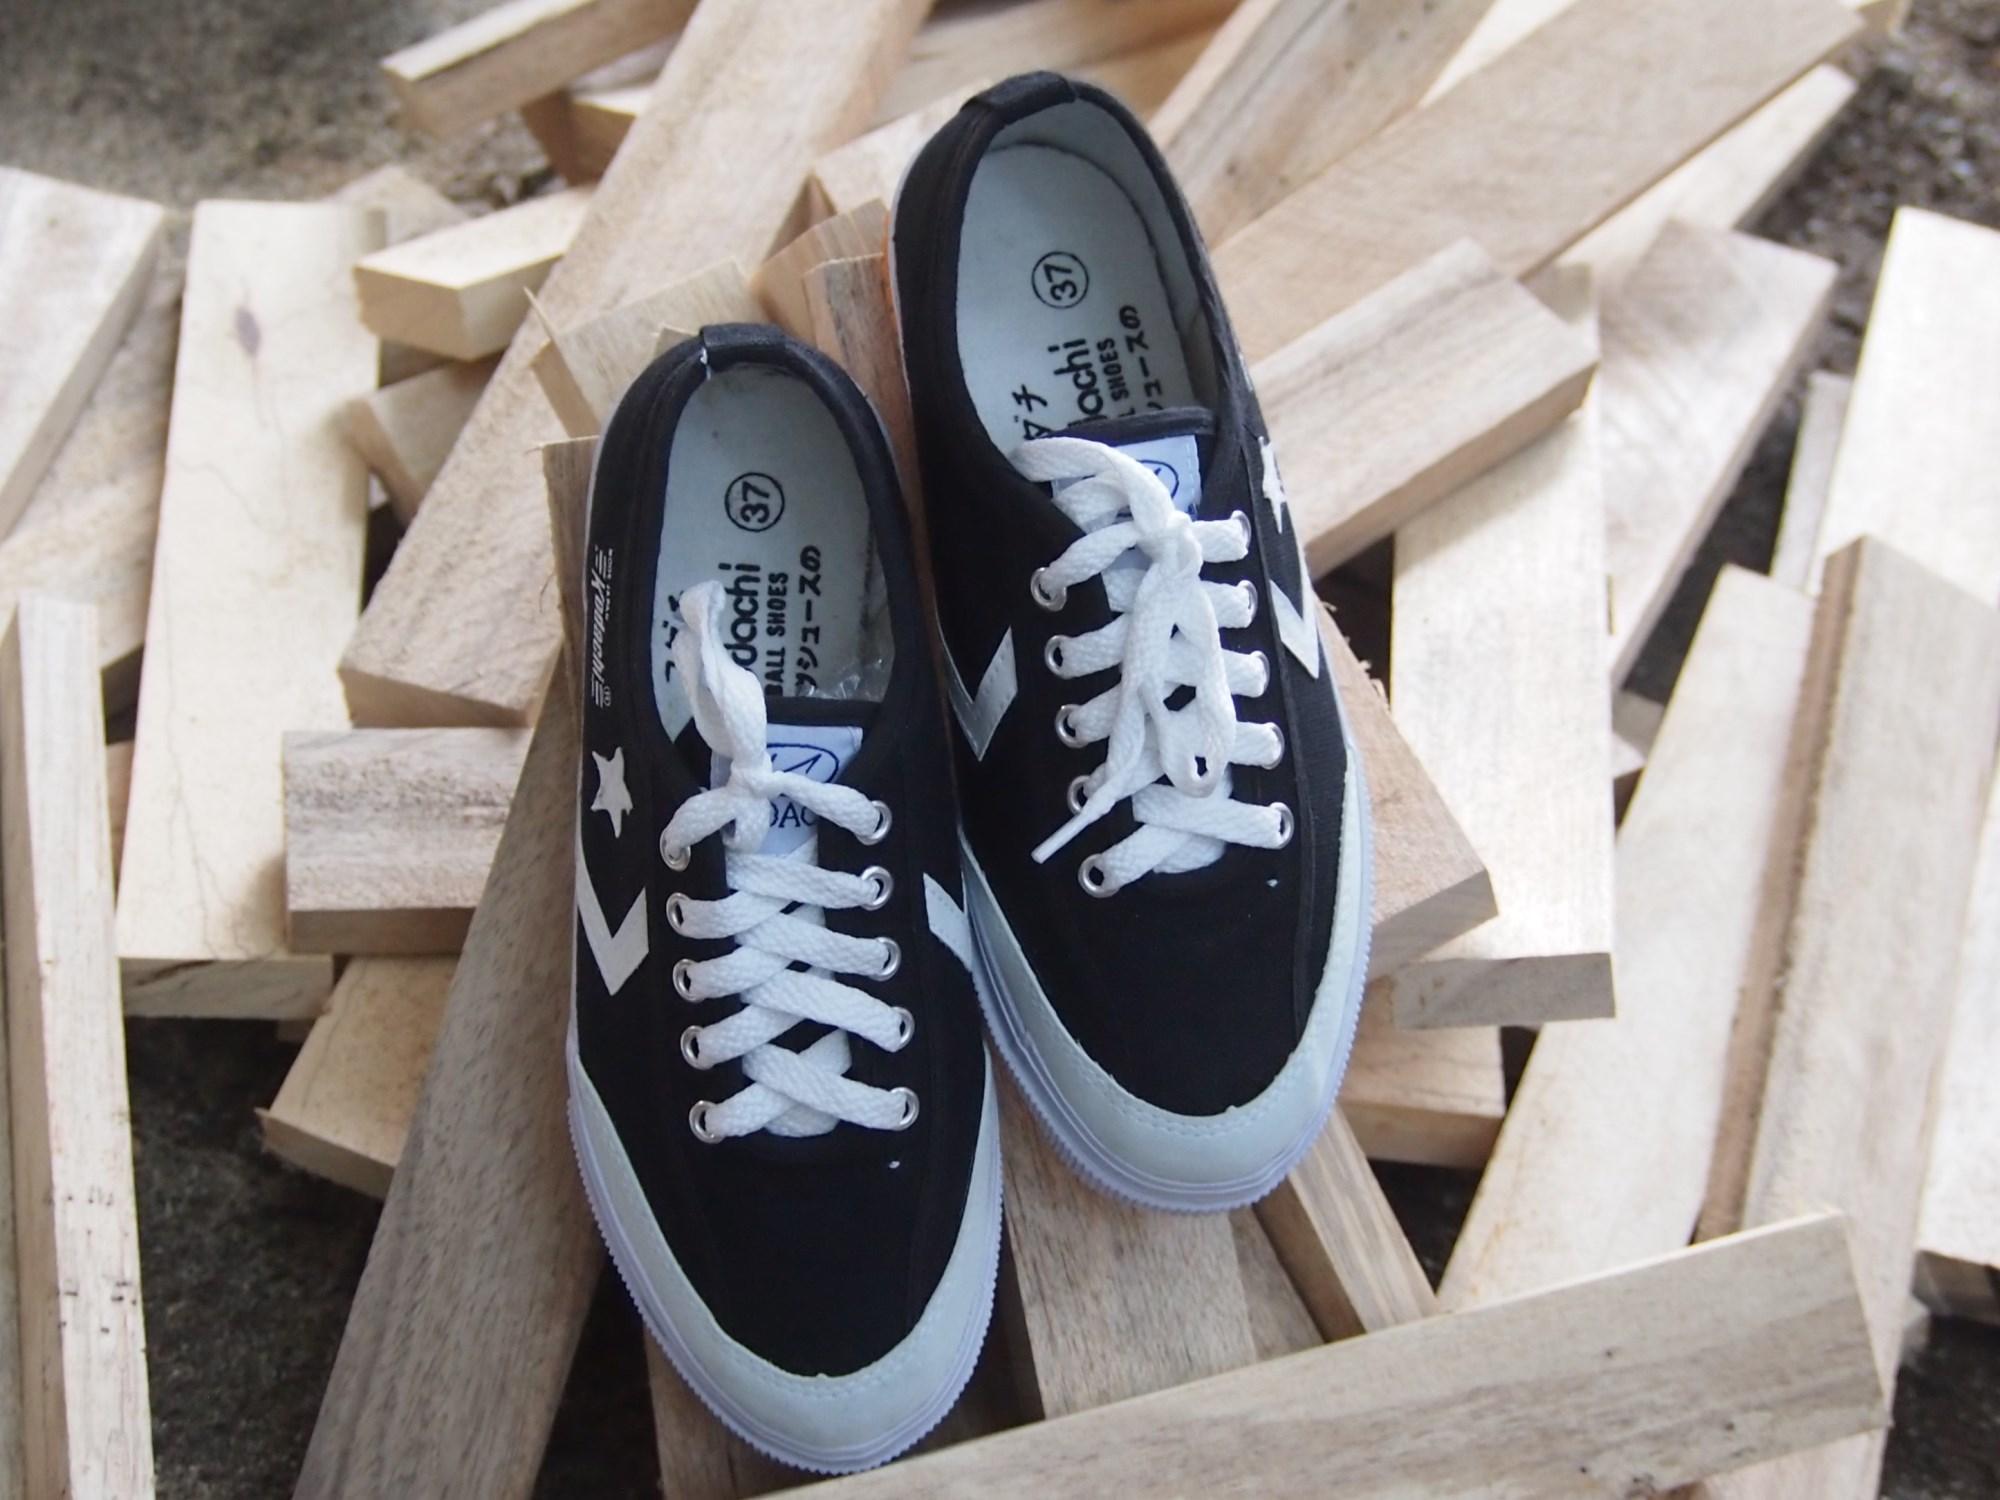 Kelebihan Import Sepatu Sport Bintang Terkini Daftar Harga Dan Kodachi 8119 Olahraga Stripe Biru